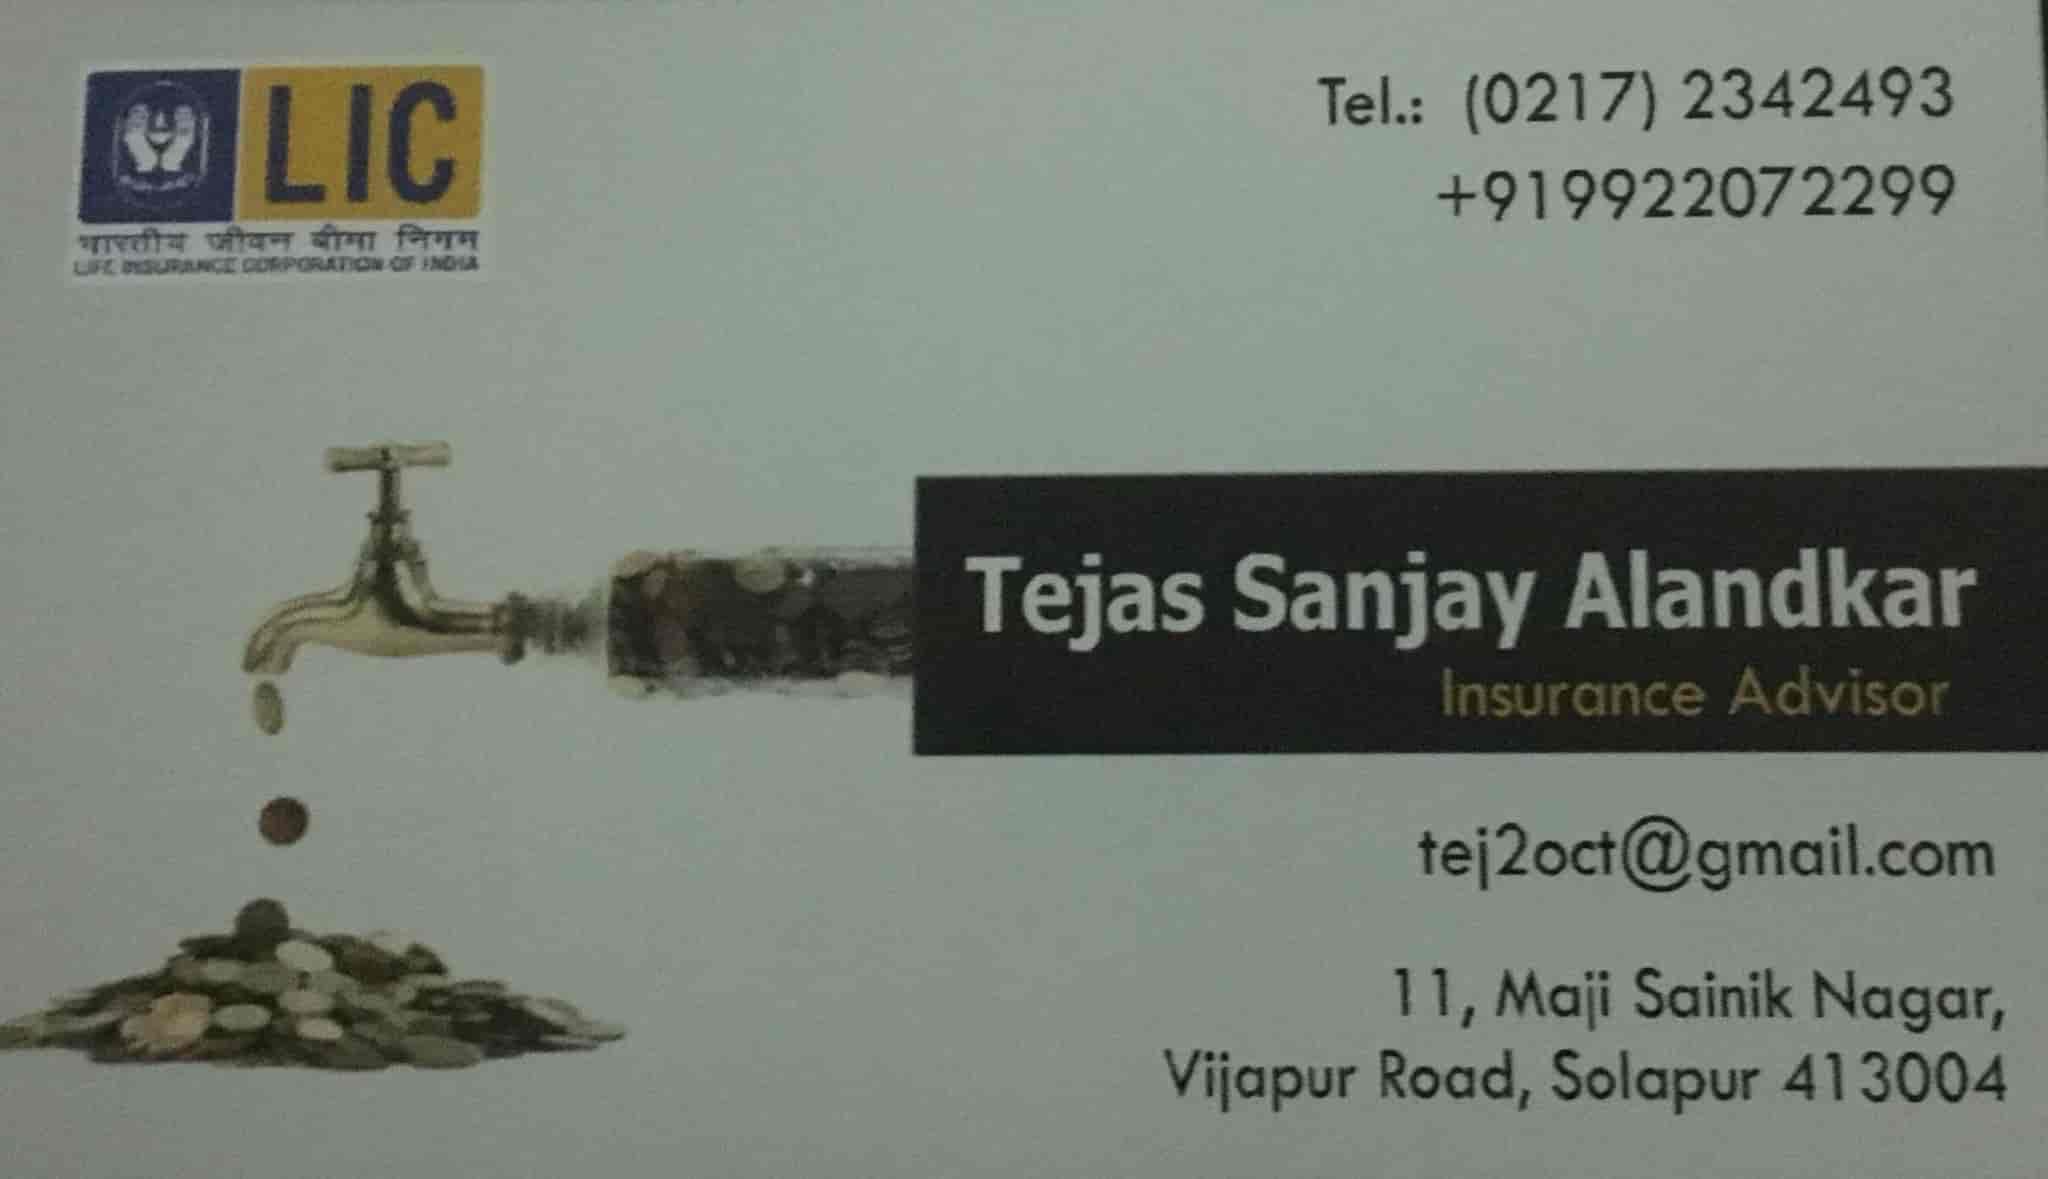 Tejas Sanjay Alandkar Lic Agent Mutual Fund Life Insurance